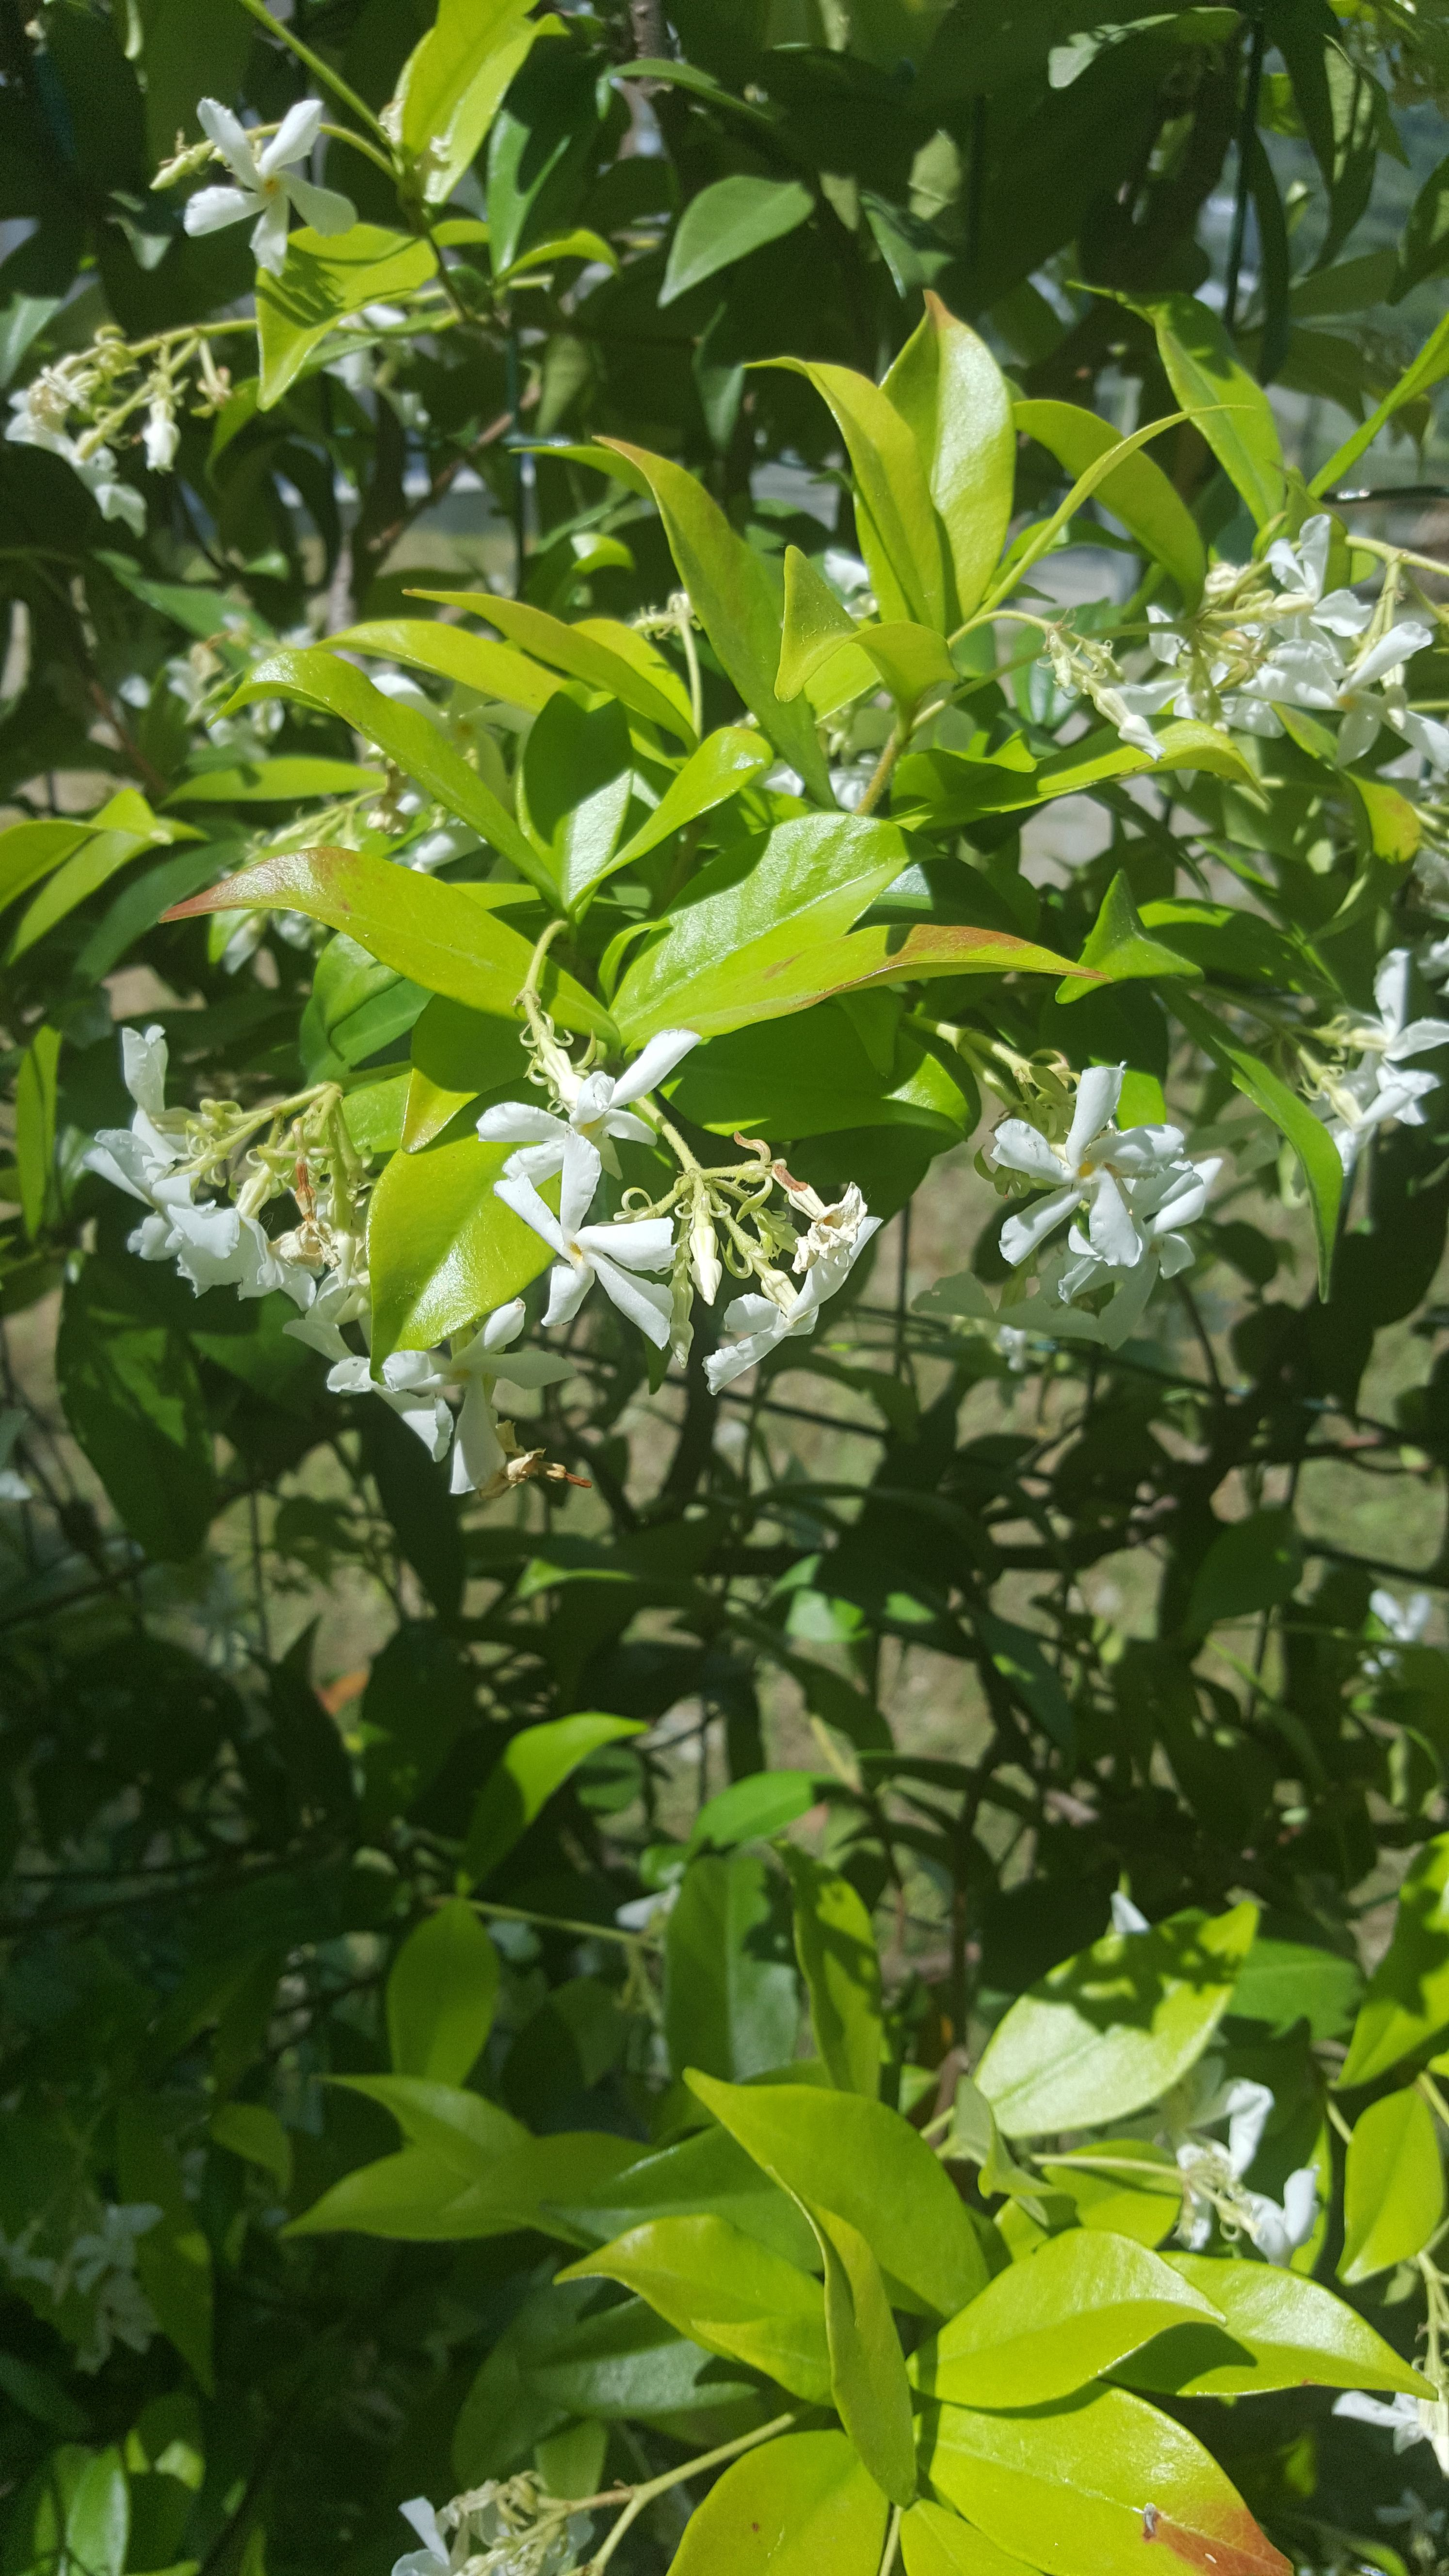 Falso Gelsomino (Rincospermum Jasminoides)